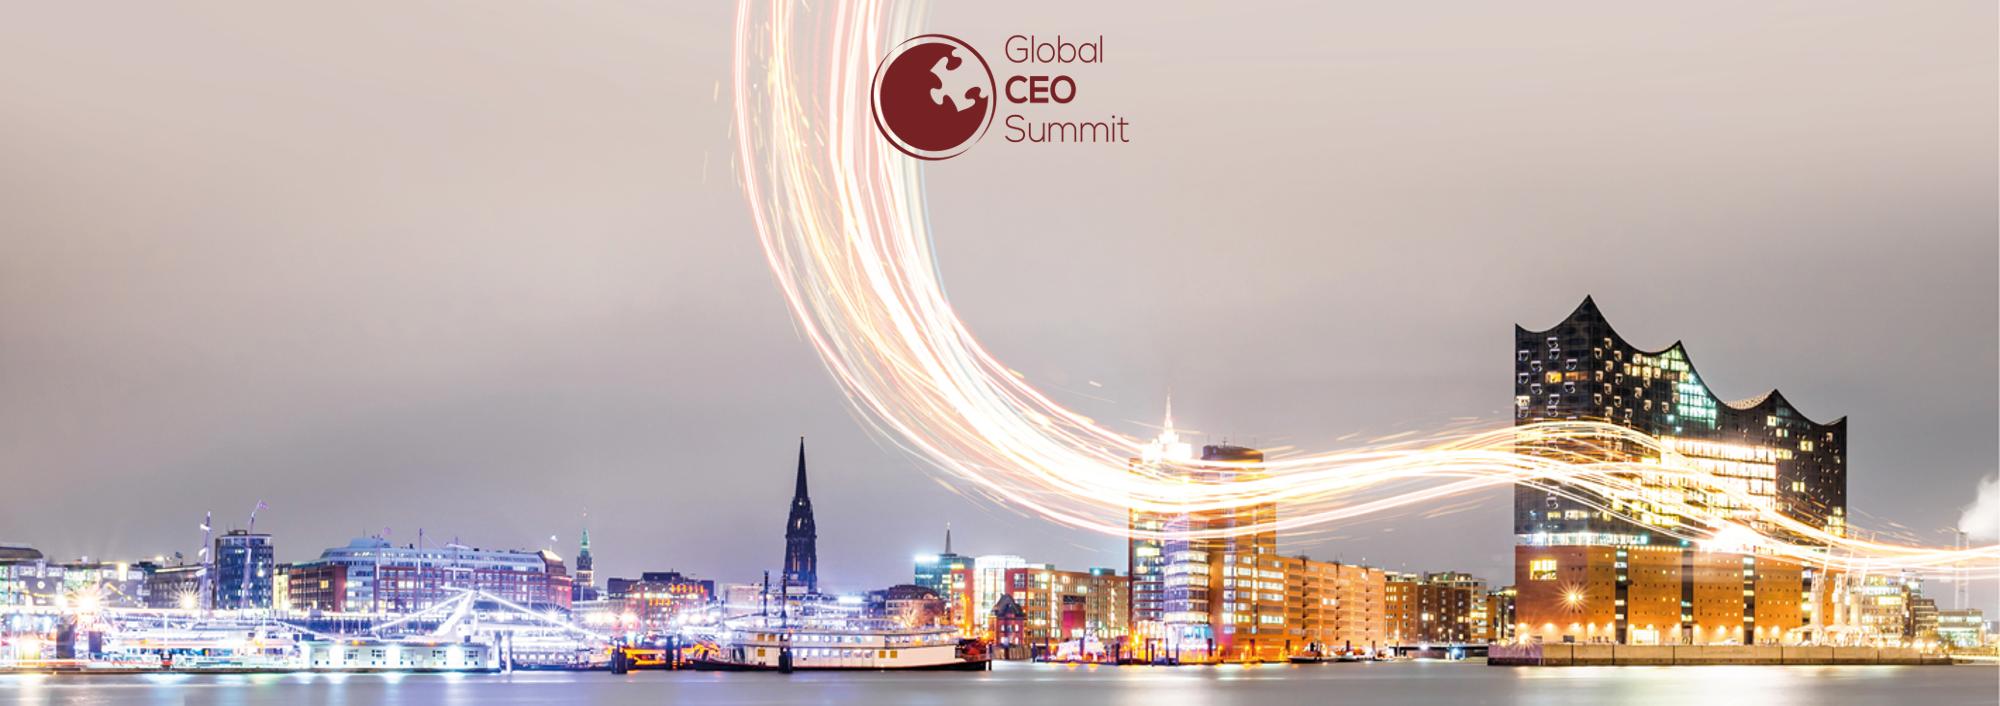 UFI Global CEO Summit 2022